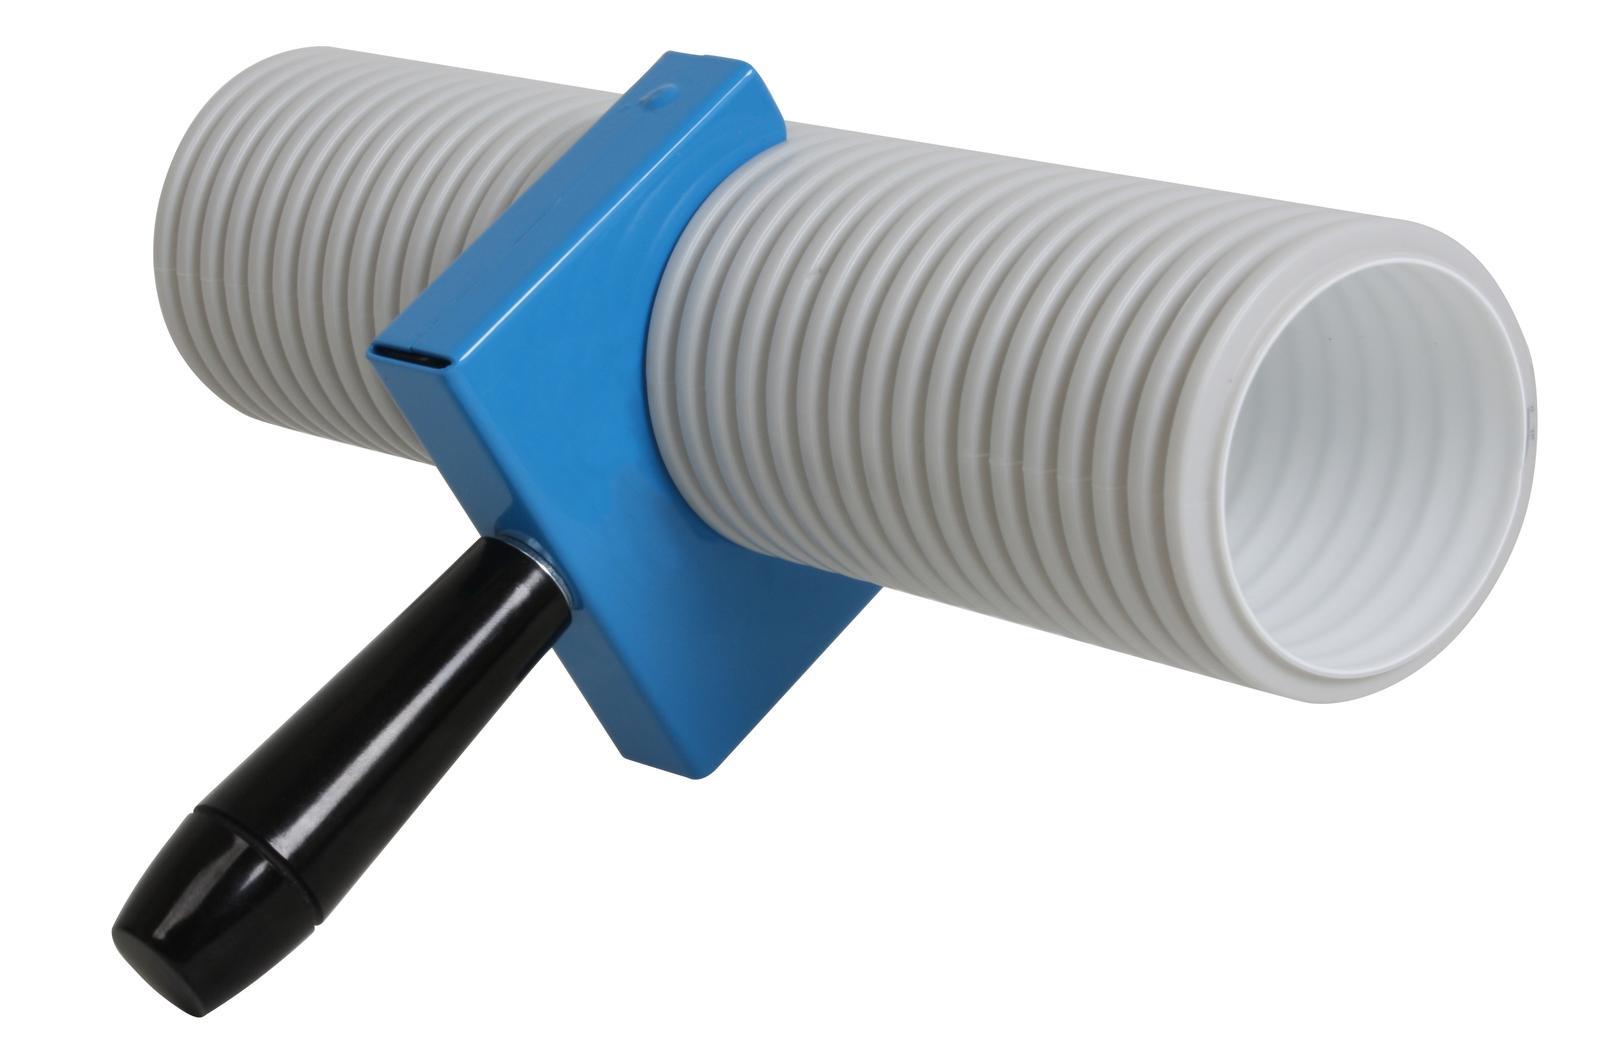 COMAIR Uniflexplus+ potrubie 75 mm (50 m) - Obrázok č. 1